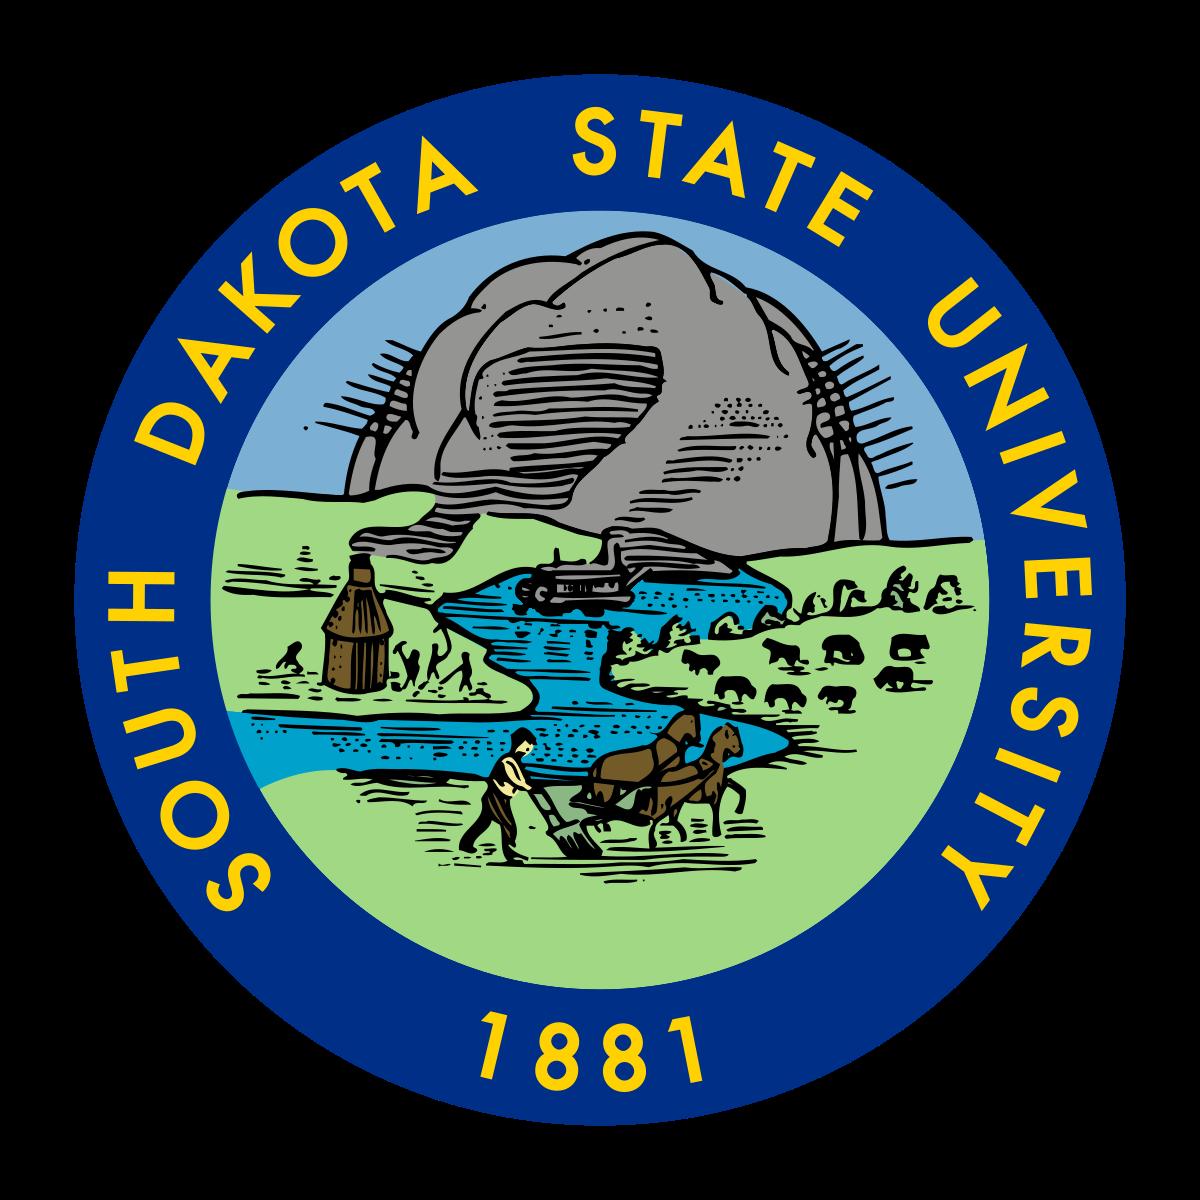 South Dakota State University.